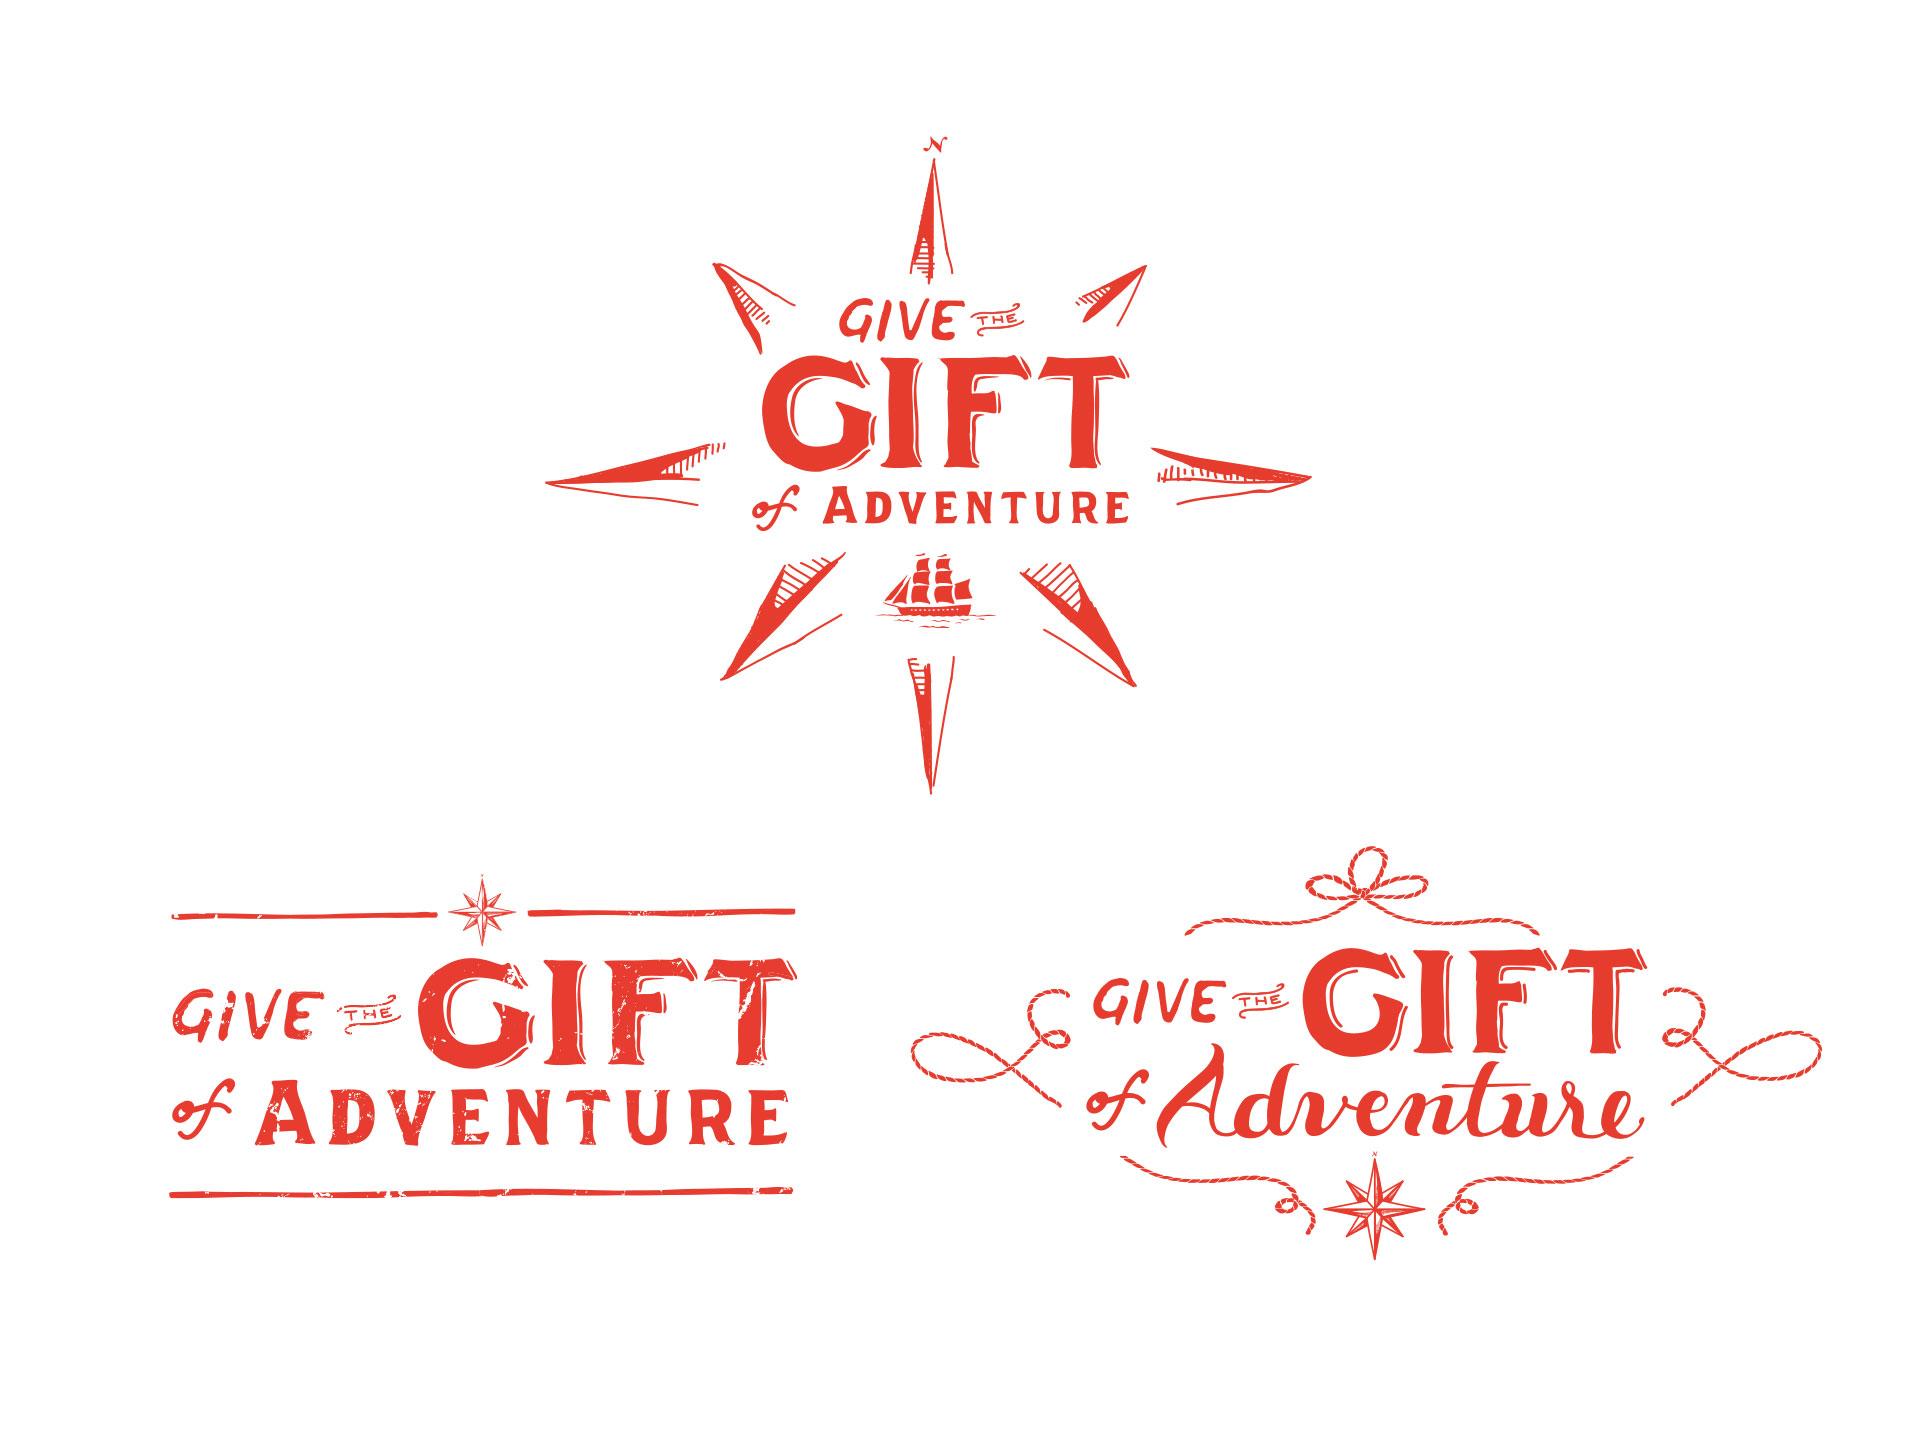 giftofadventure.jpg